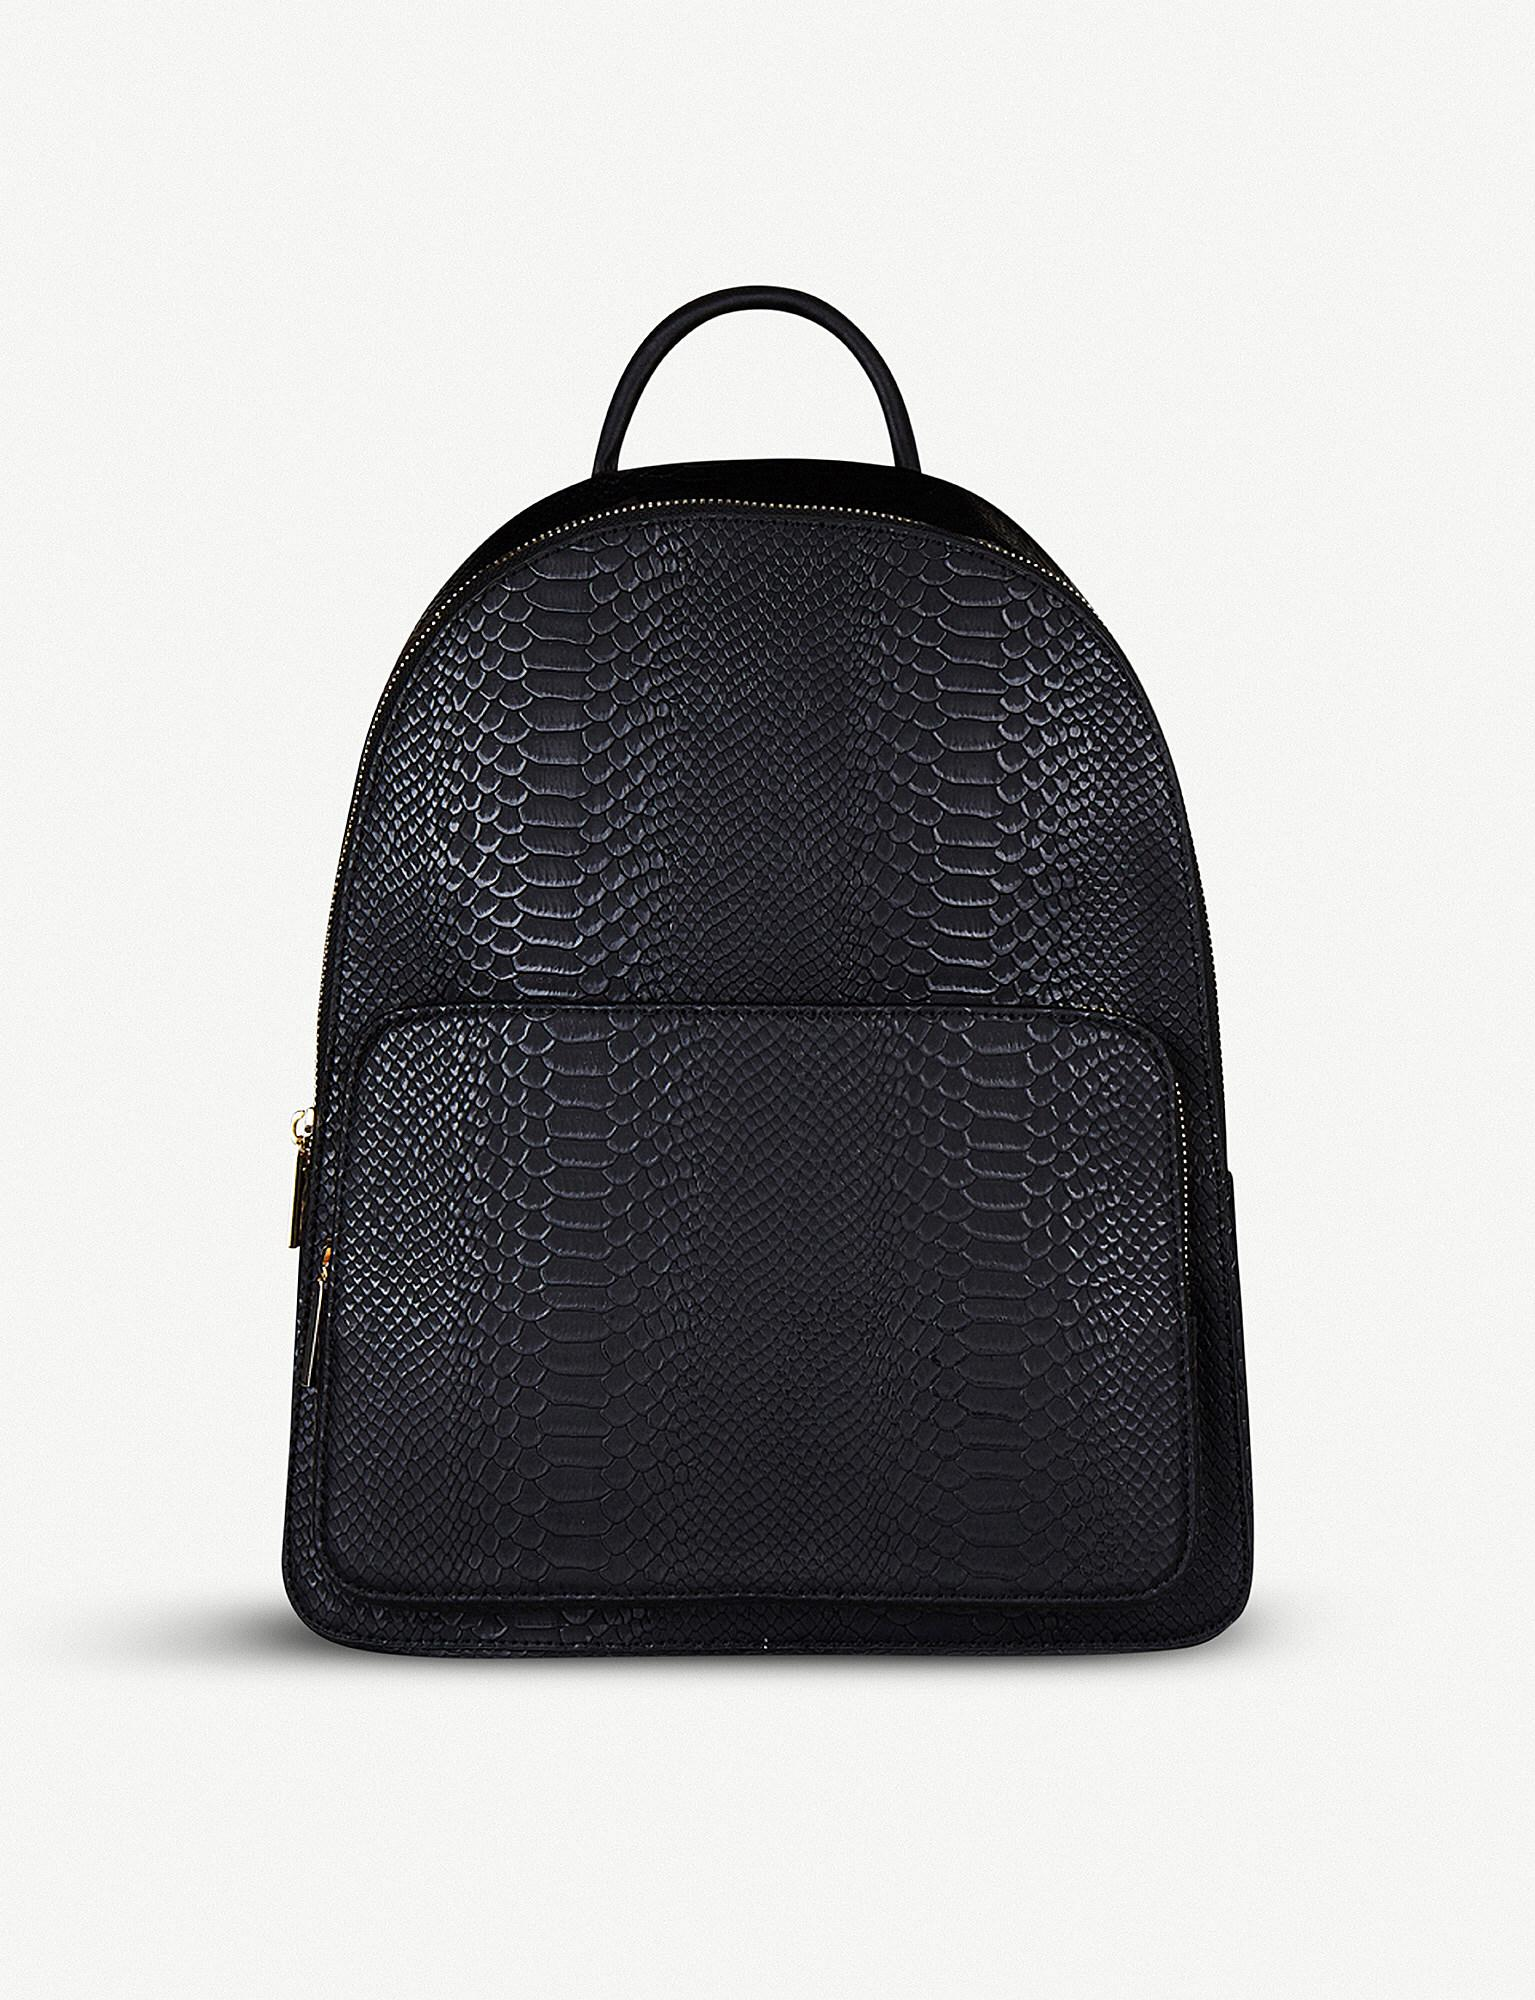 Star Embossed Pocket Velvet Backpack - Black Skinny Dip 8SnXwTabWK